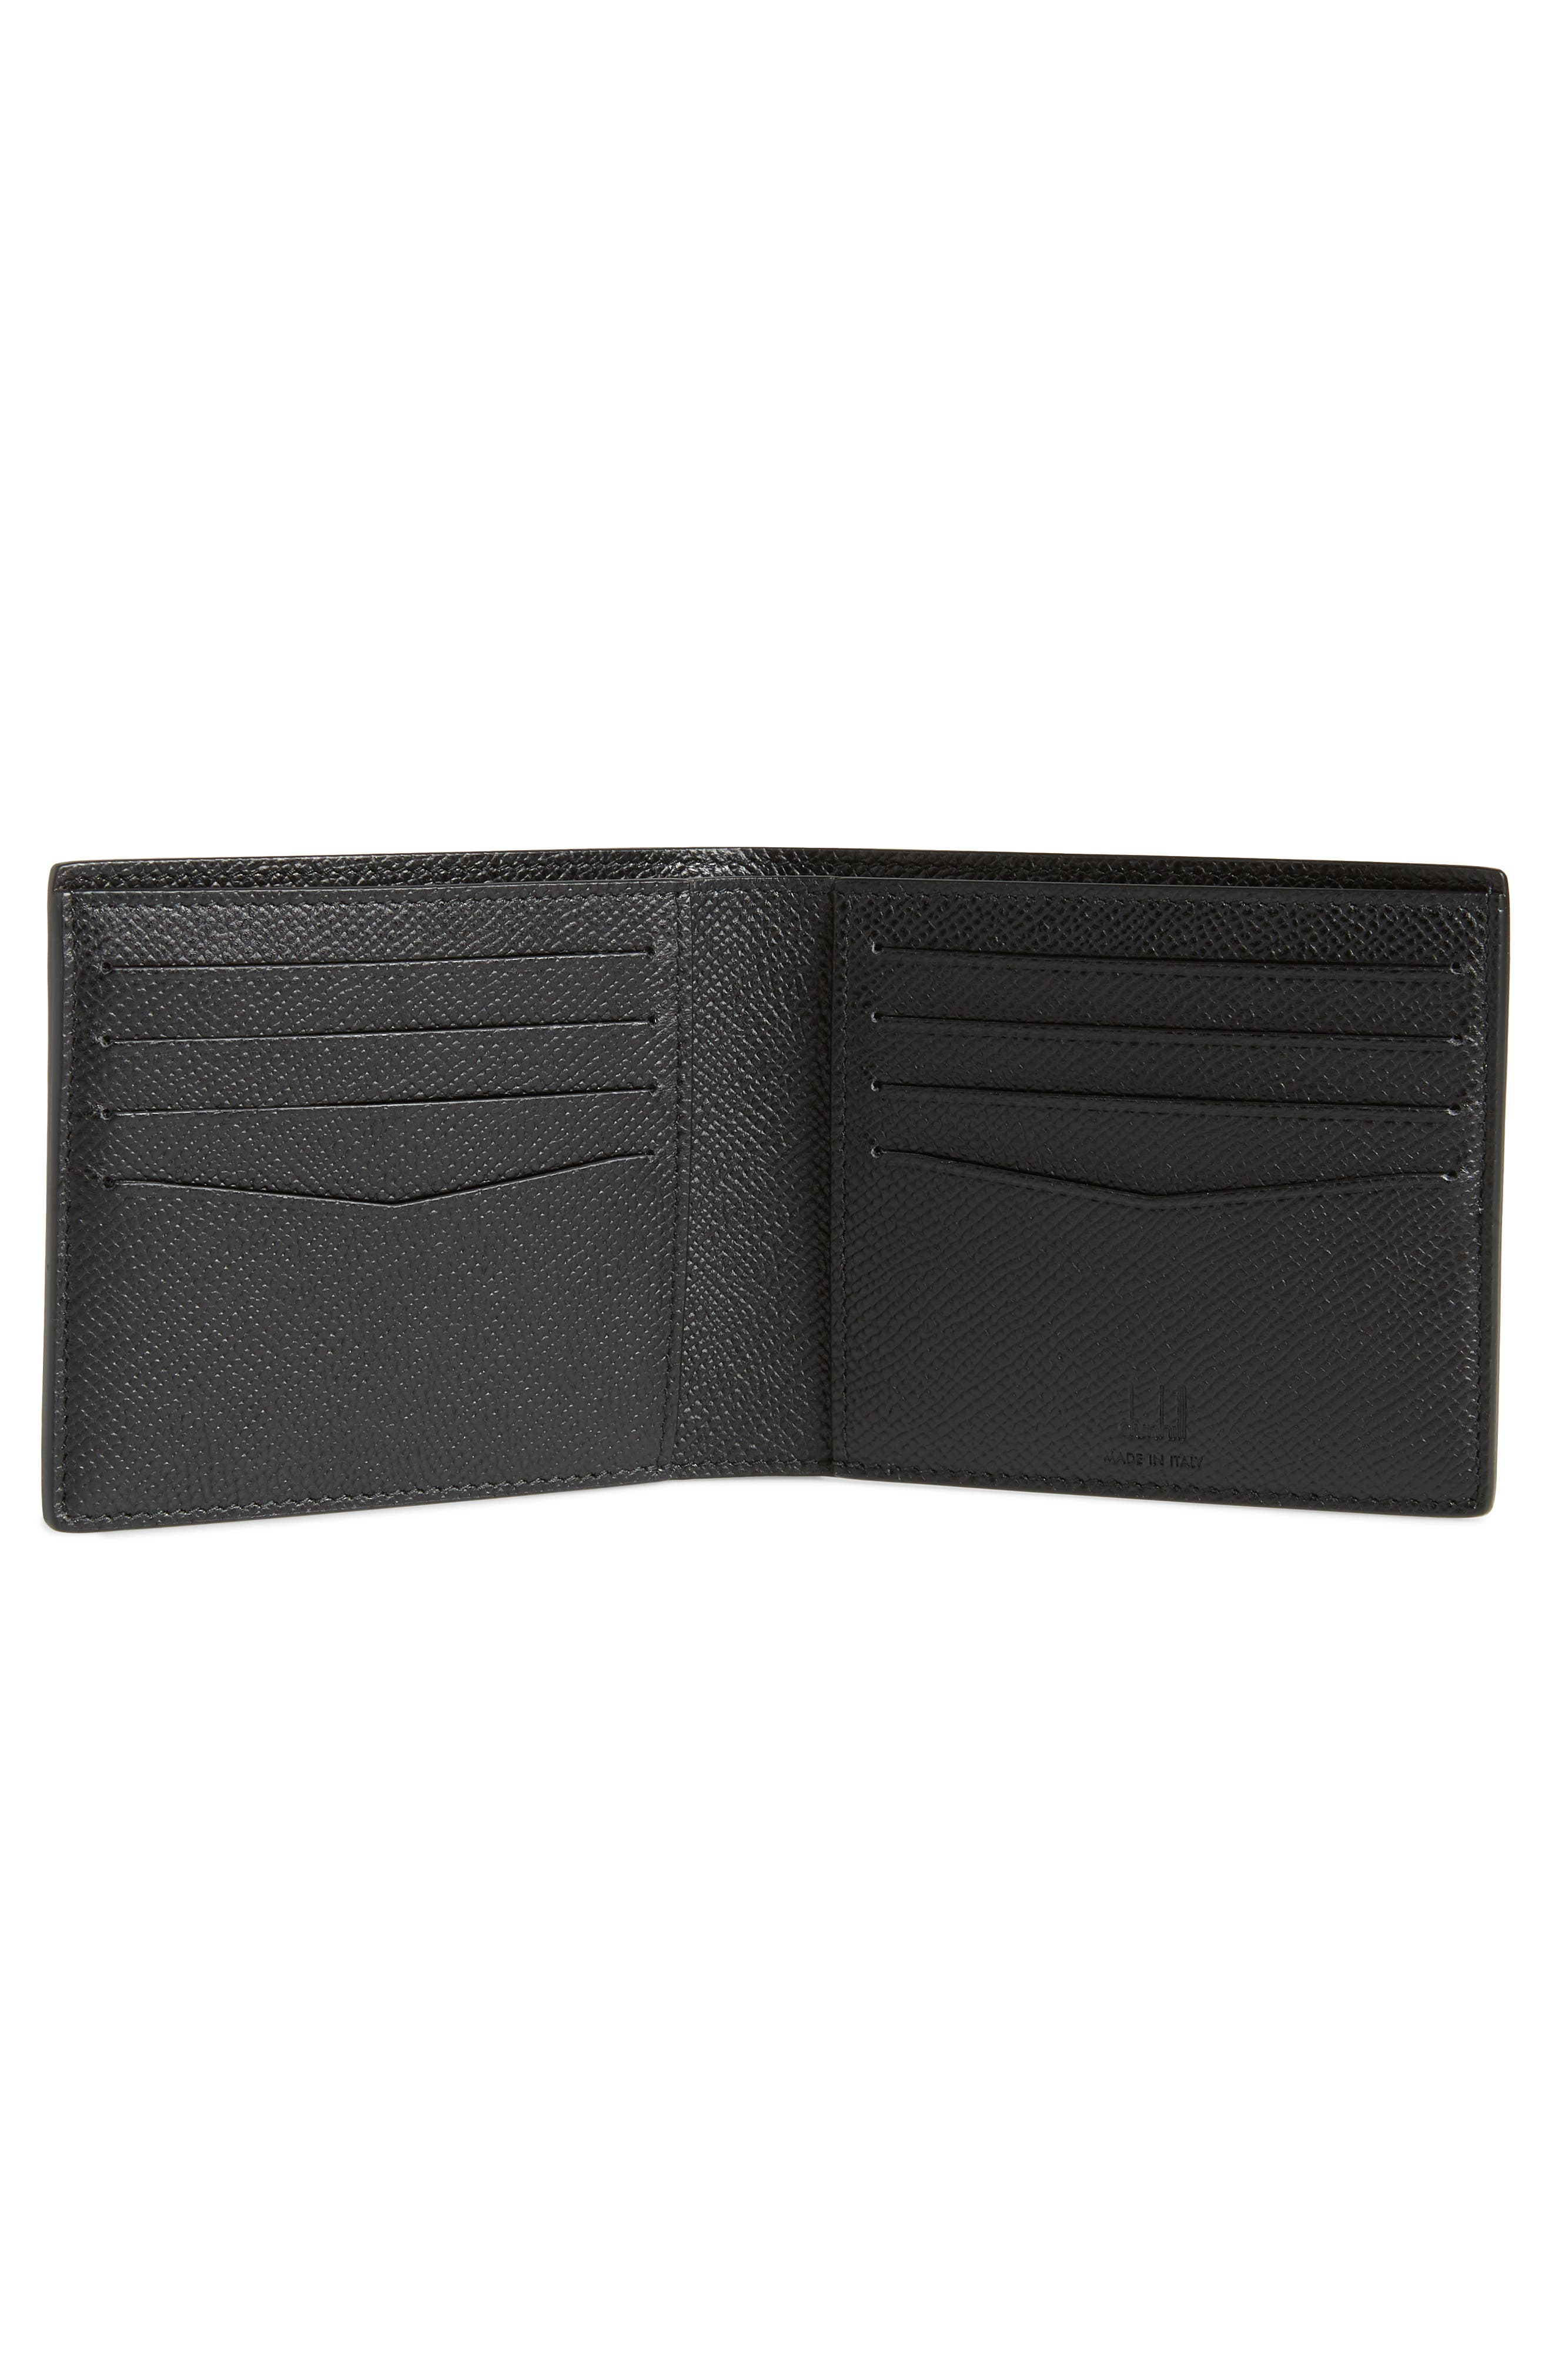 Cadogan Leather Wallet,                             Alternate thumbnail 2, color,                             BLACK